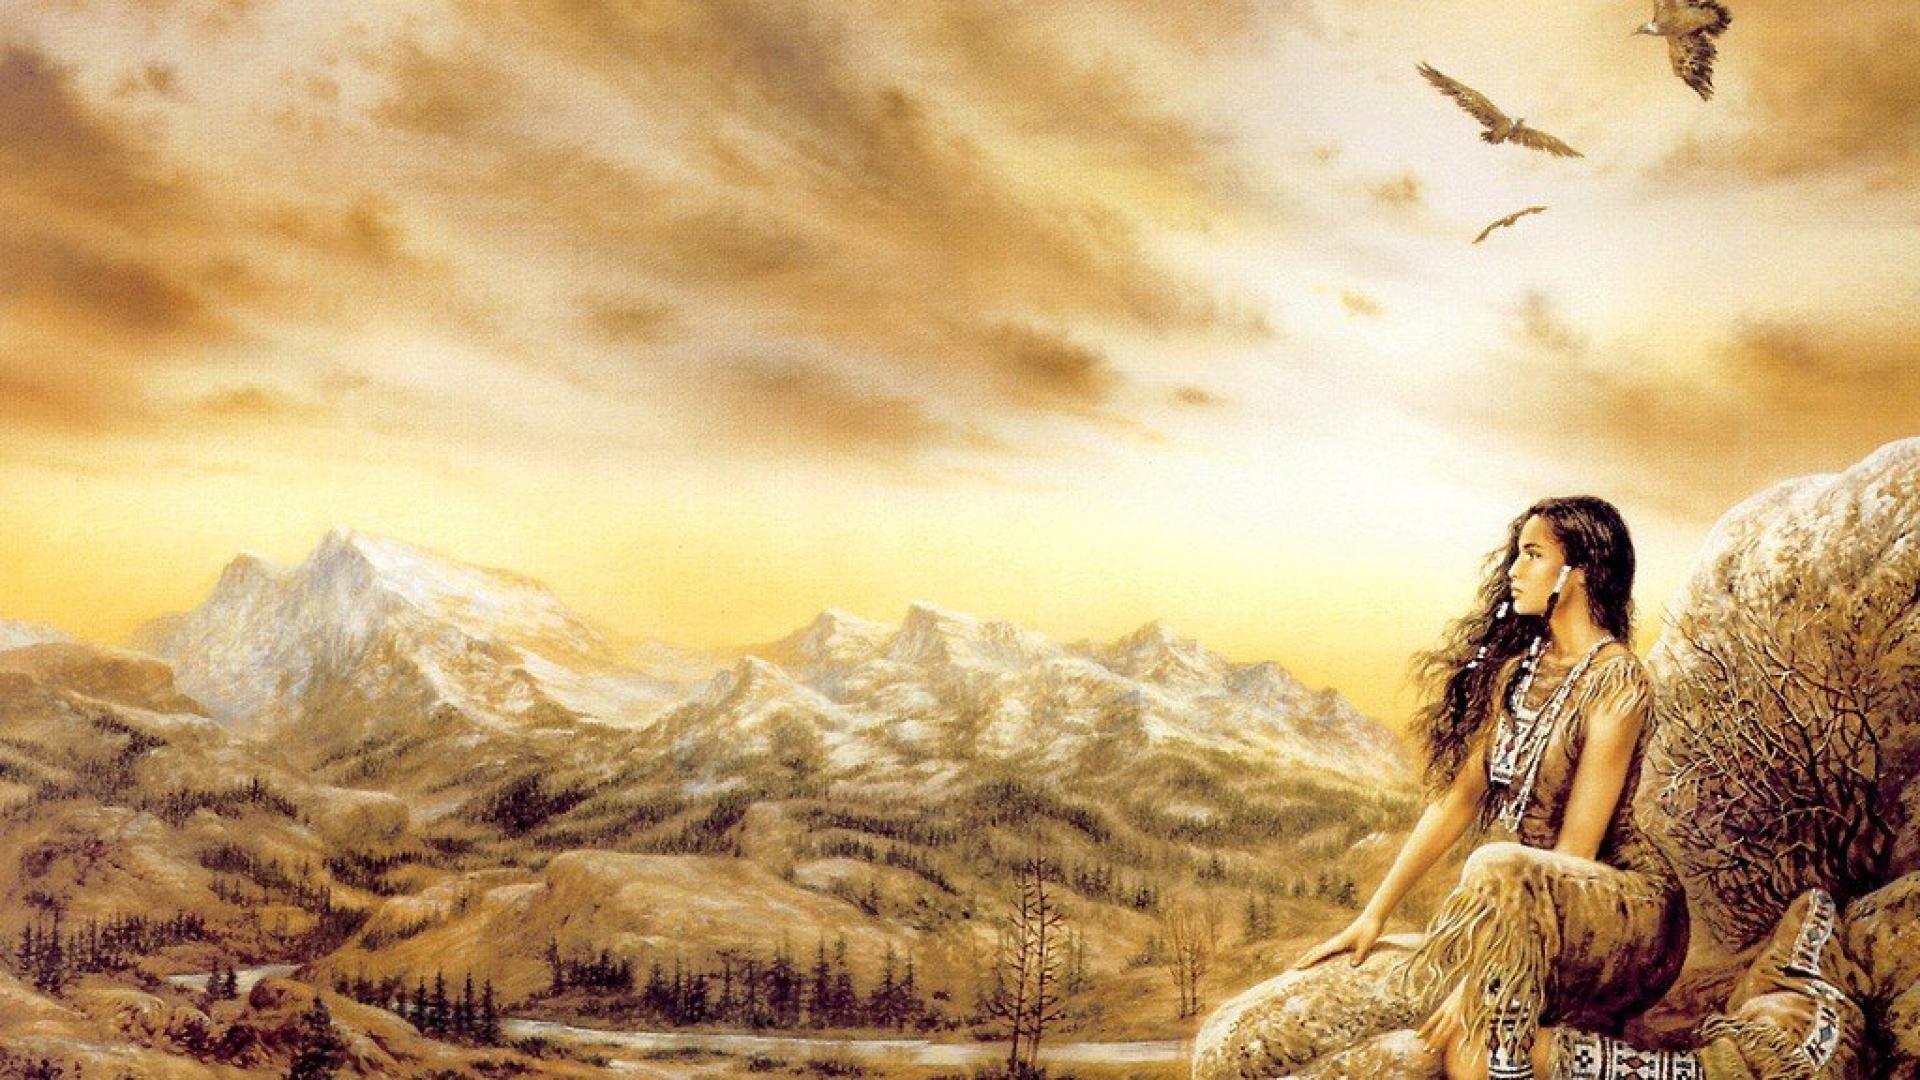 American Indian Wallpaper – image #393